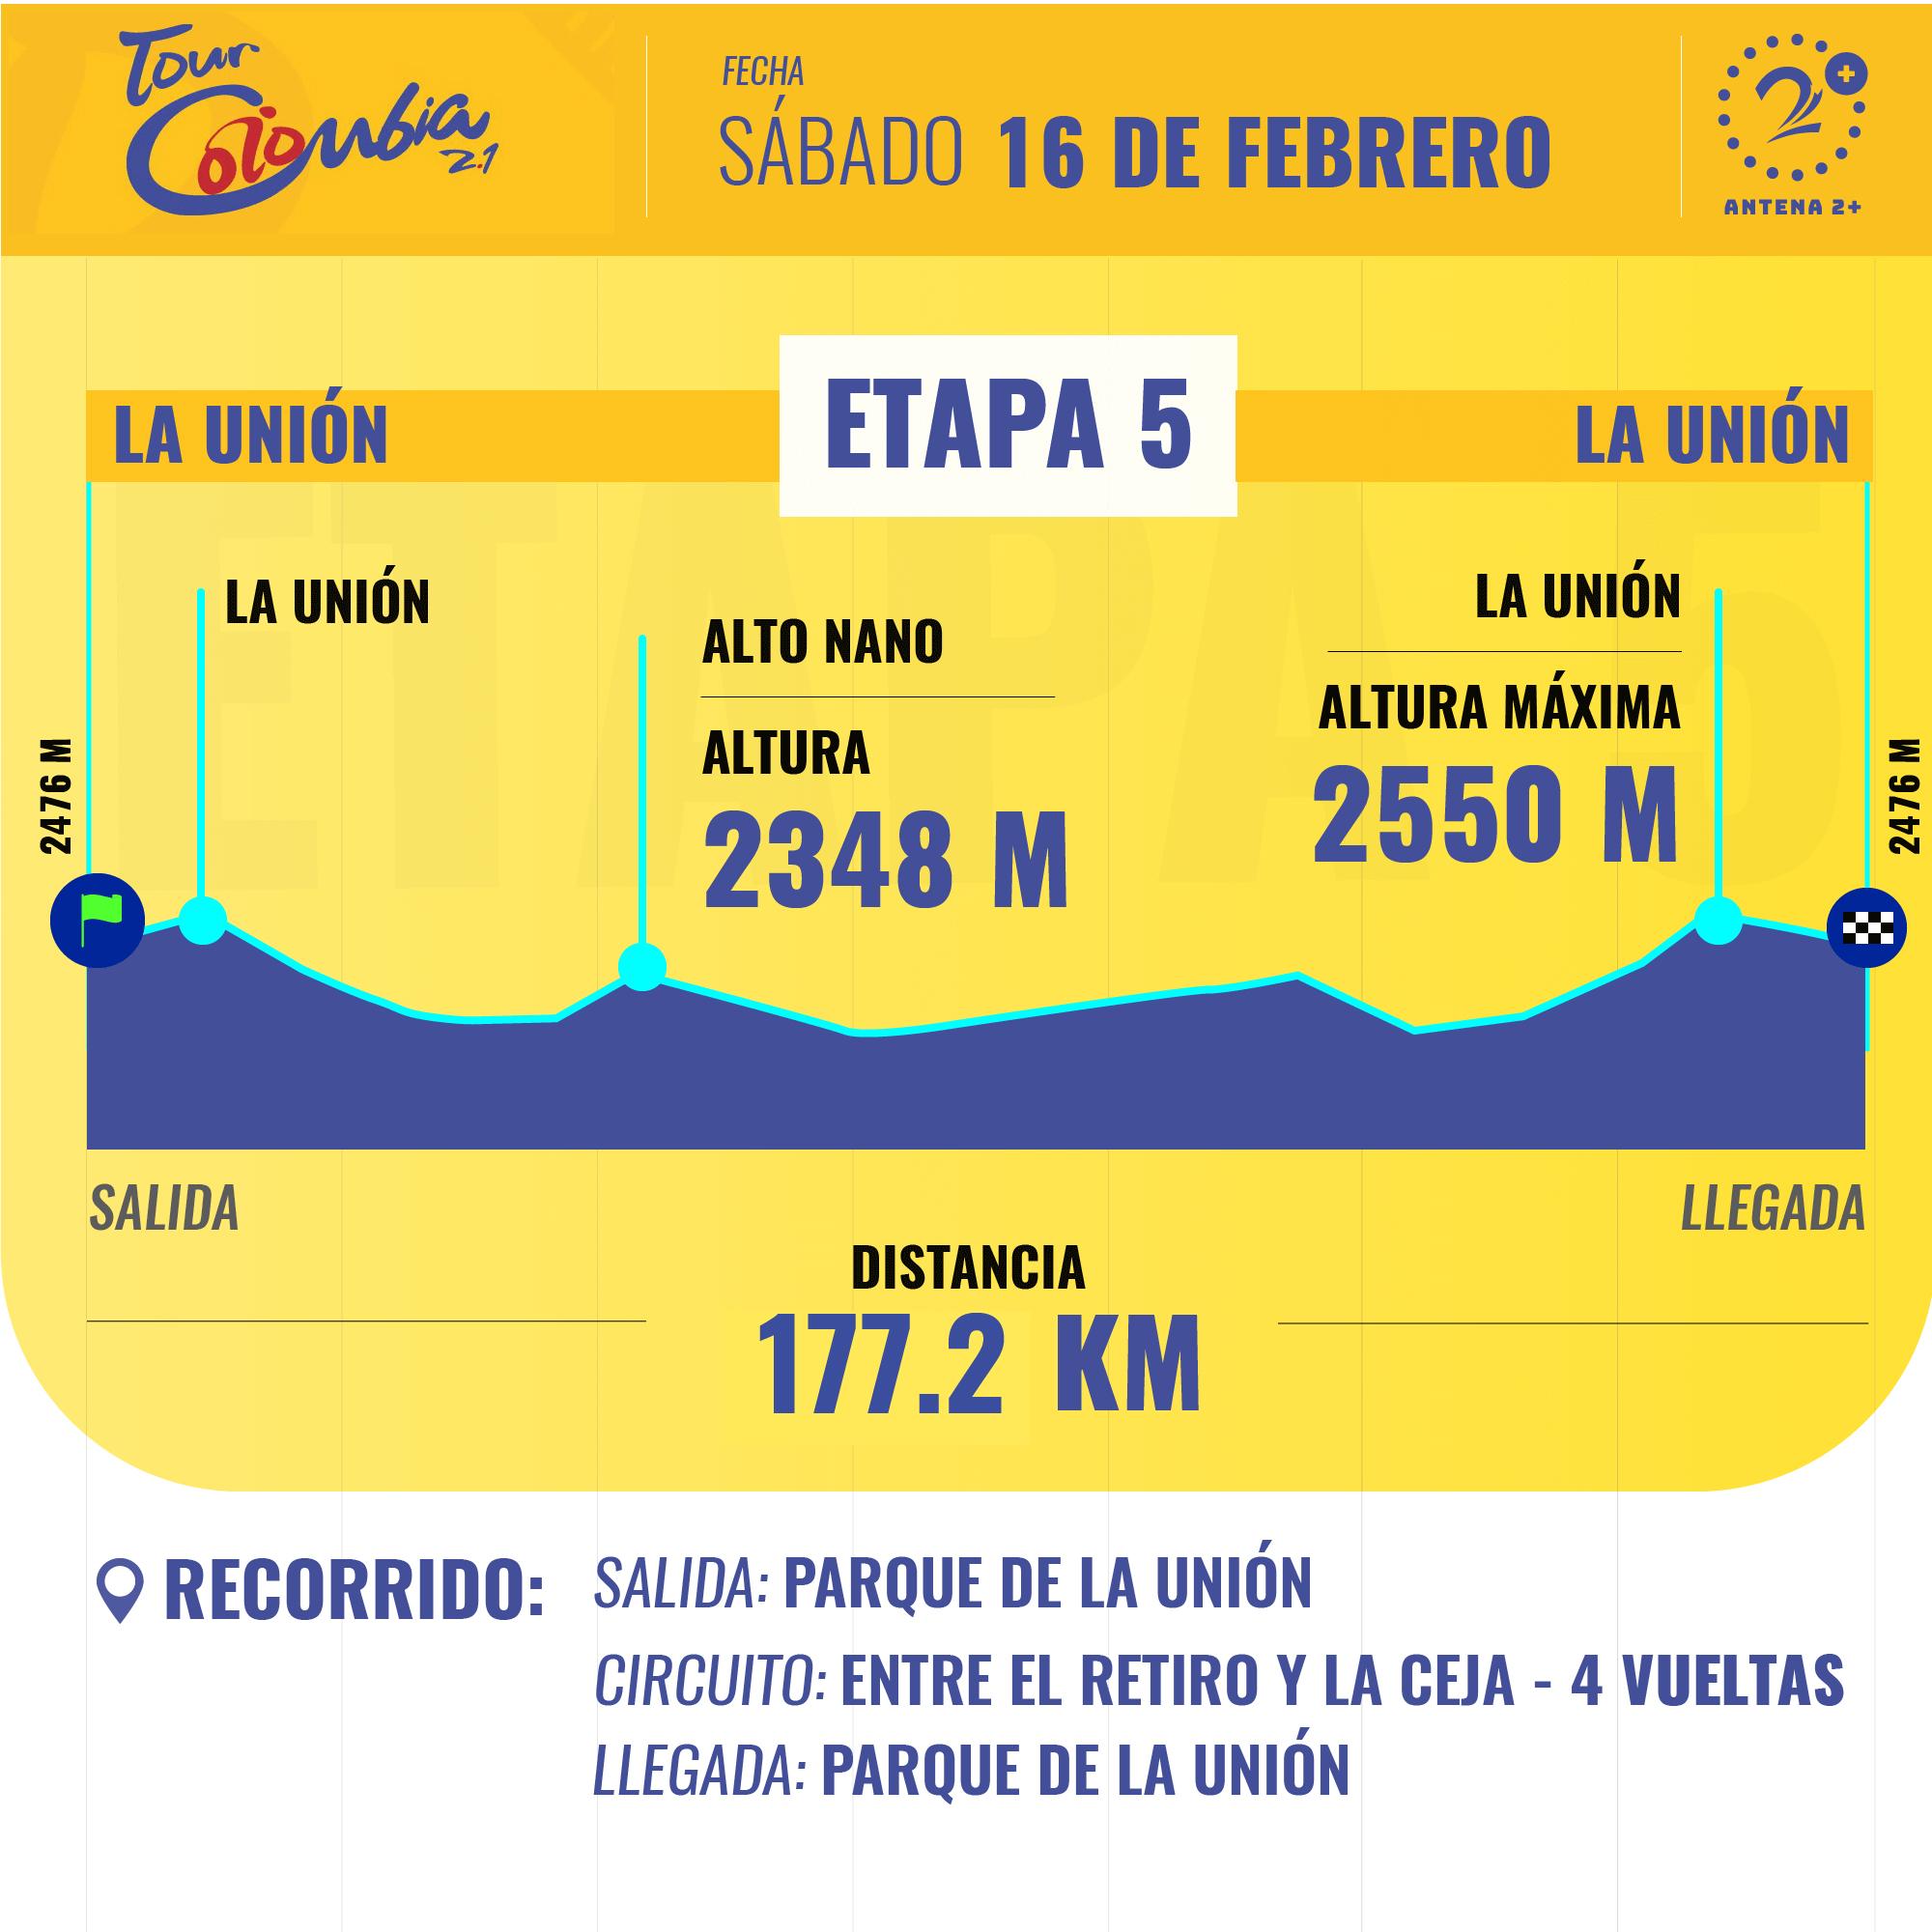 La  5ª etapa del Tour Colombia